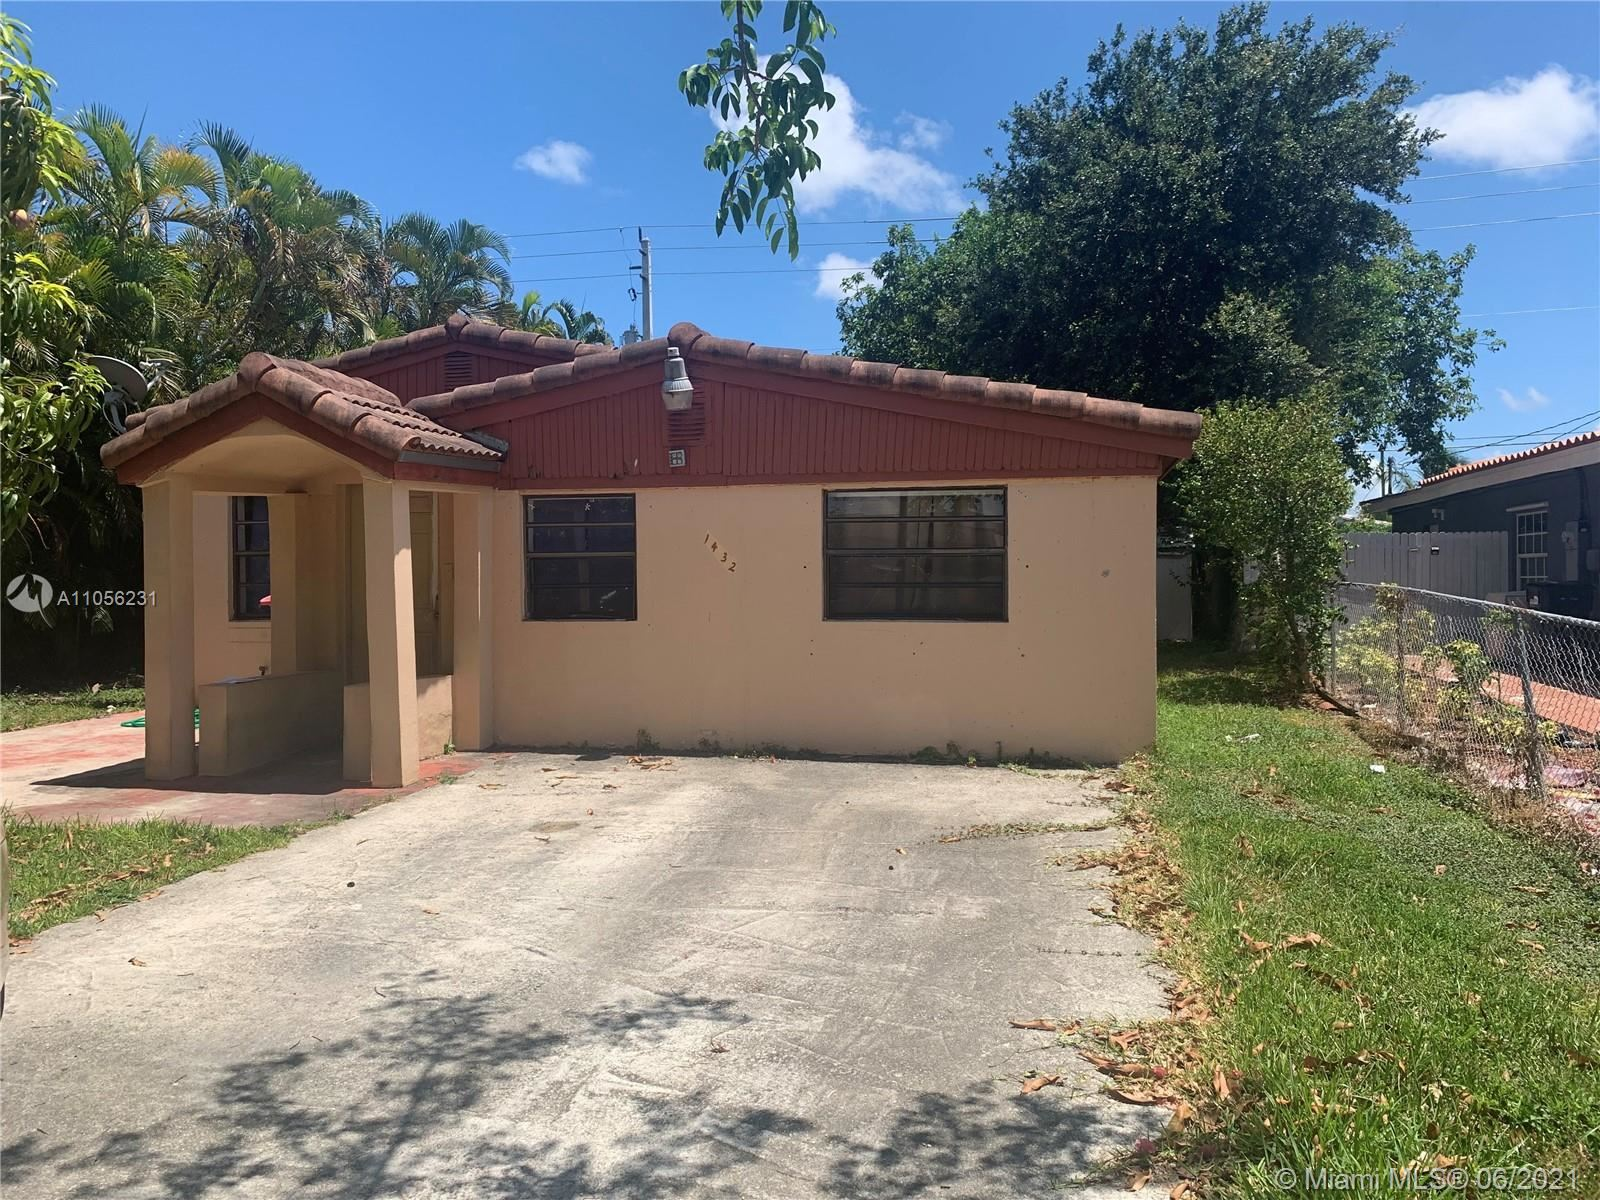 1432 NE 183rd St, North Miami Beach, FL 33179 - #: A11056231